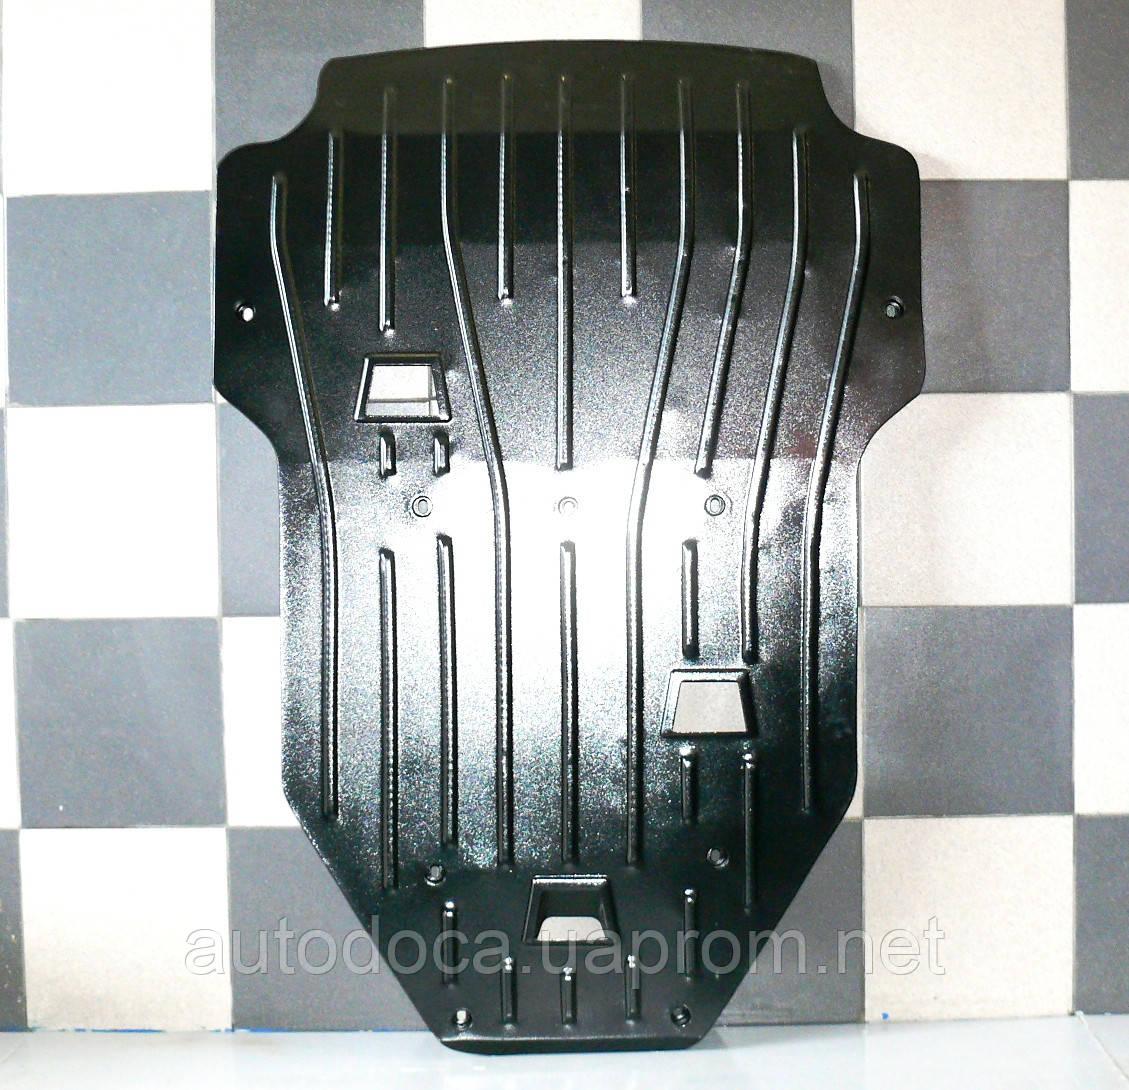 Защита картера двигателя и кпп Audi S8 2011-